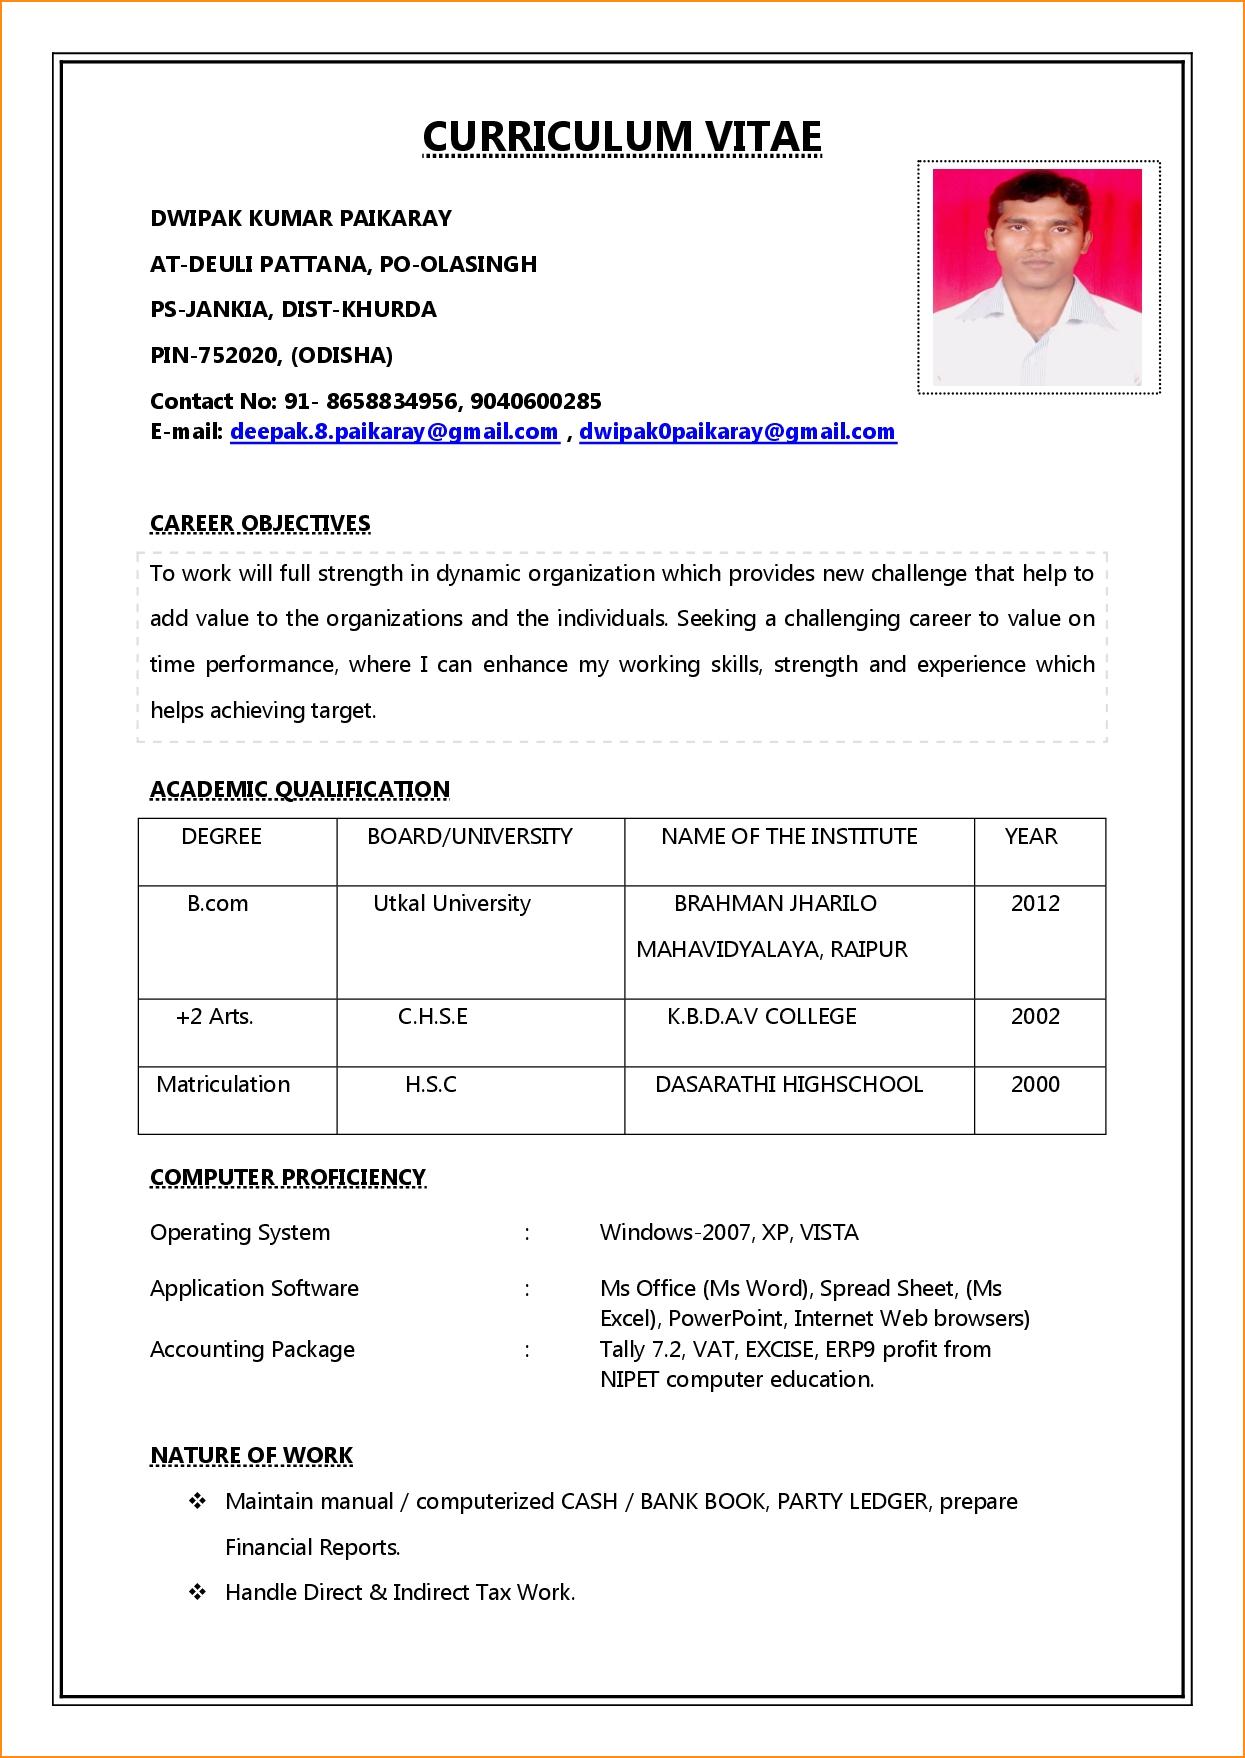 Resume Format Job format resume Job resume format, Job